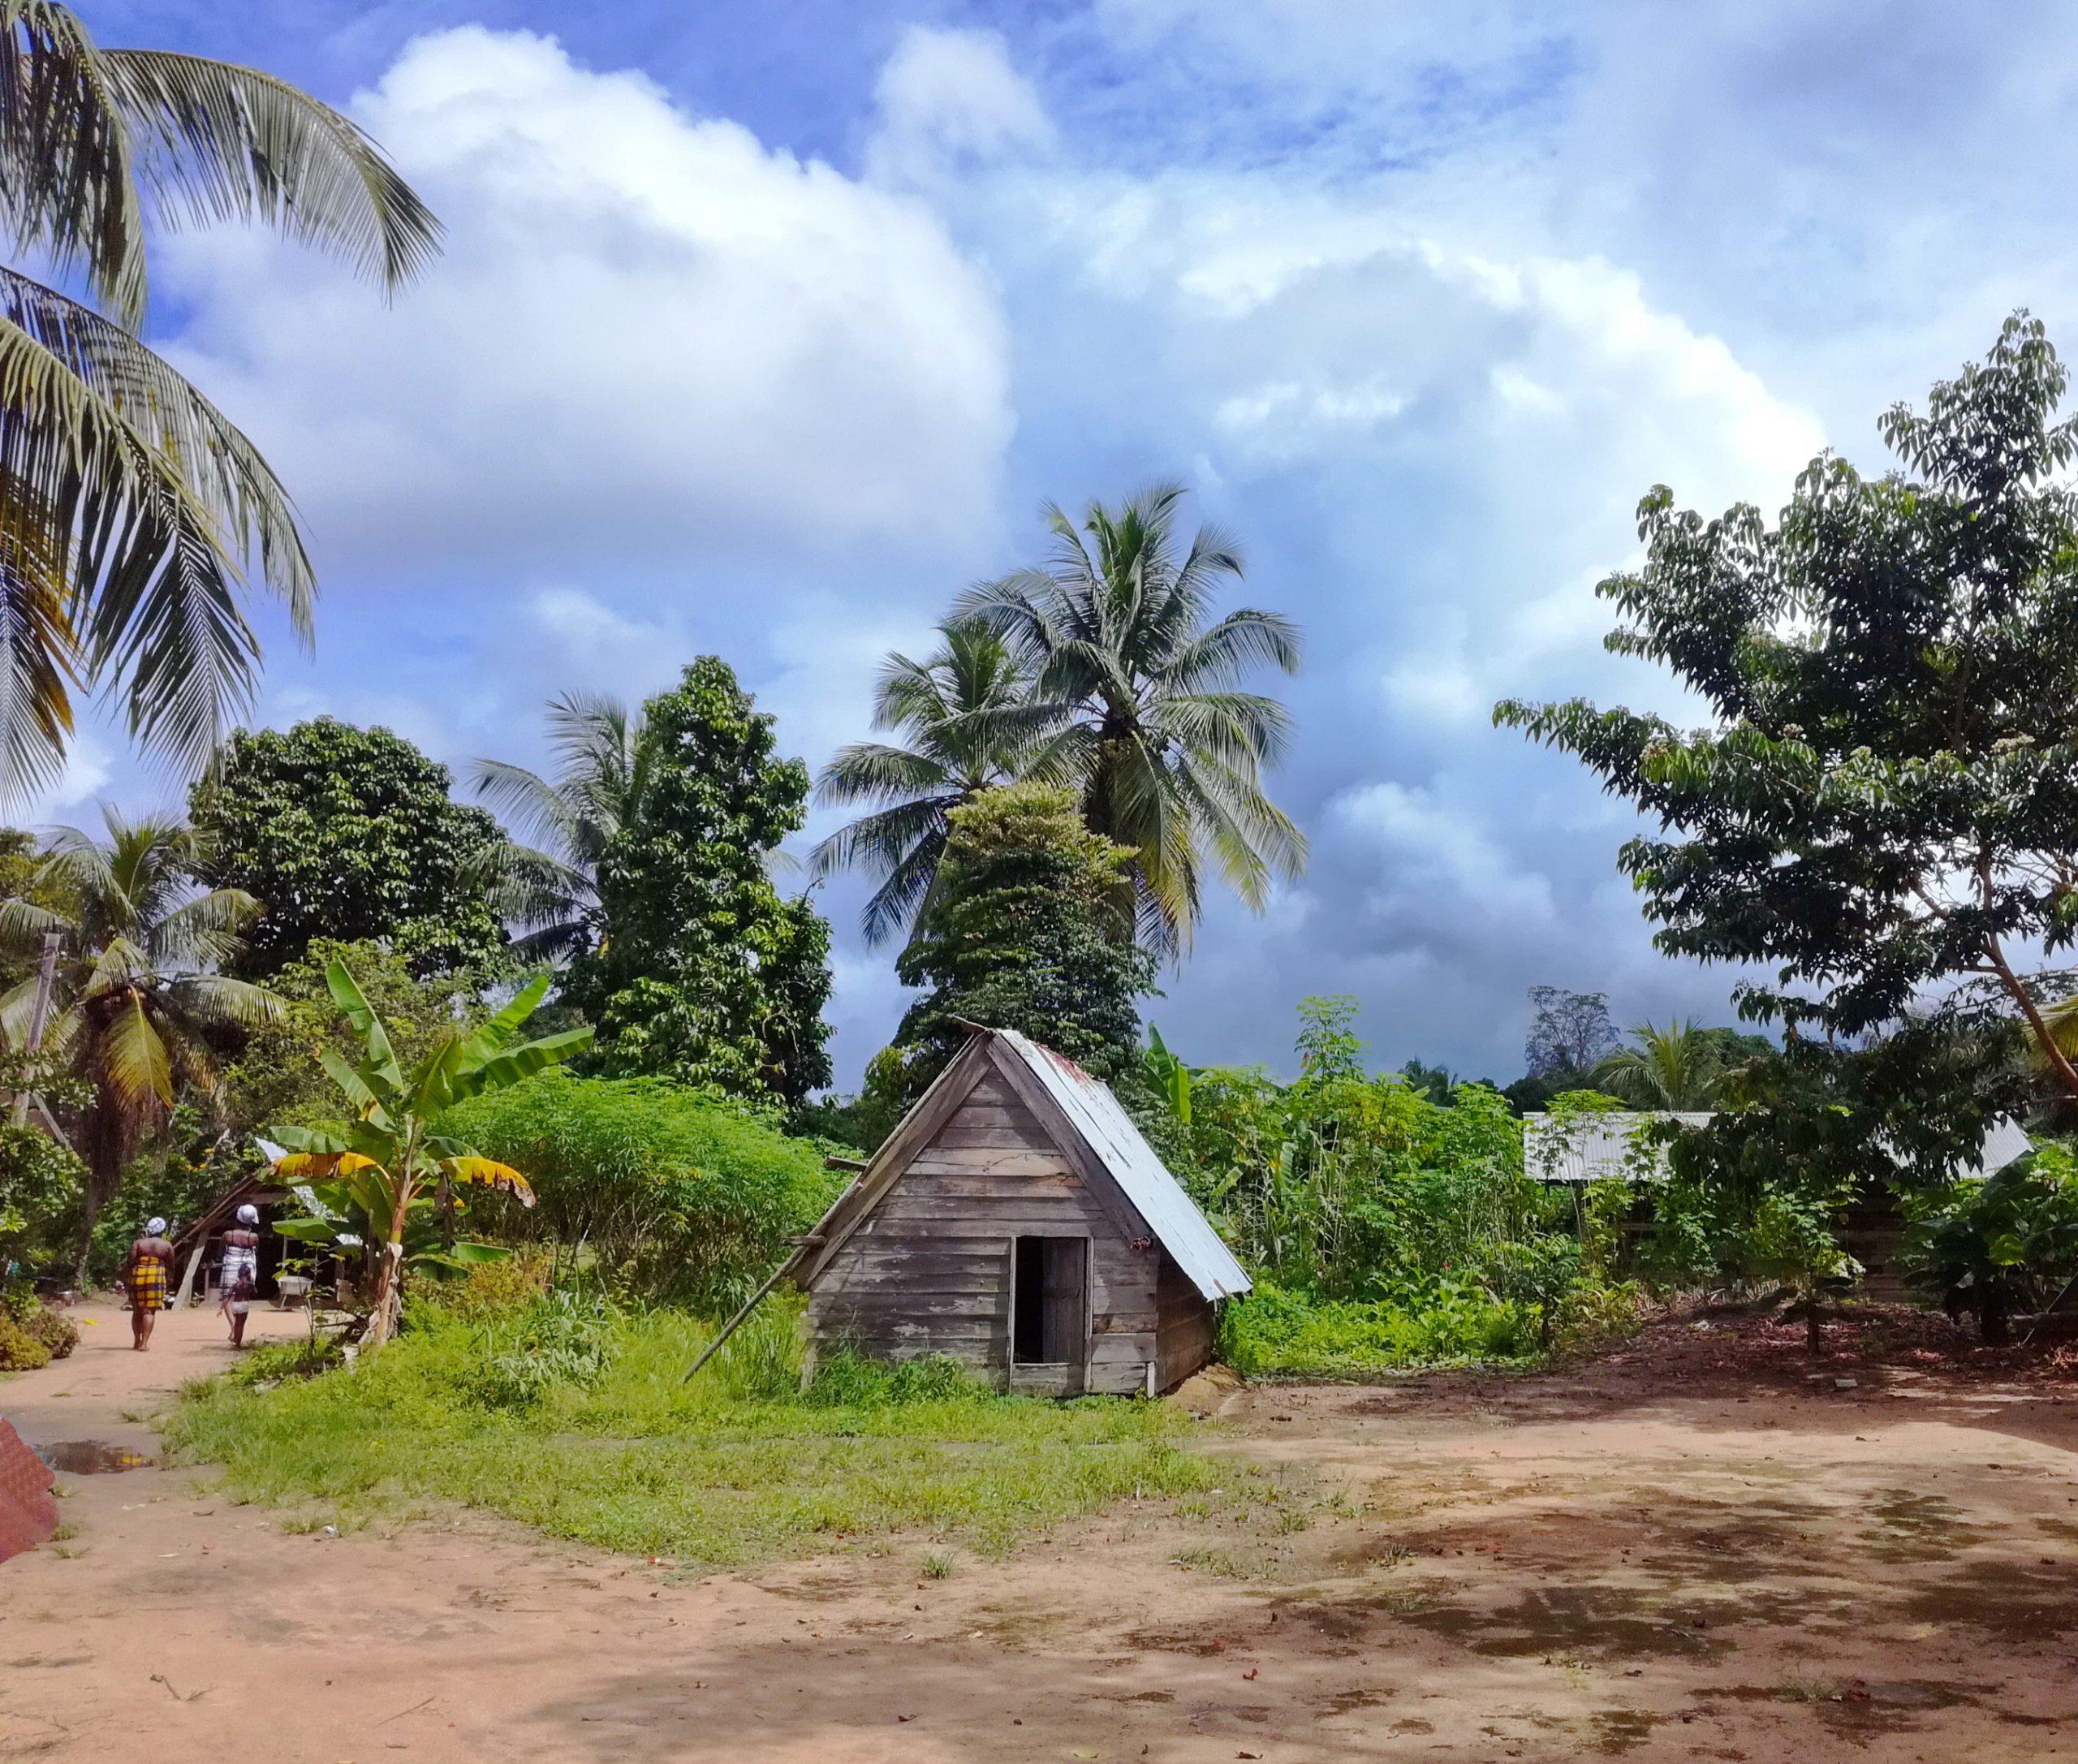 Maroons Village